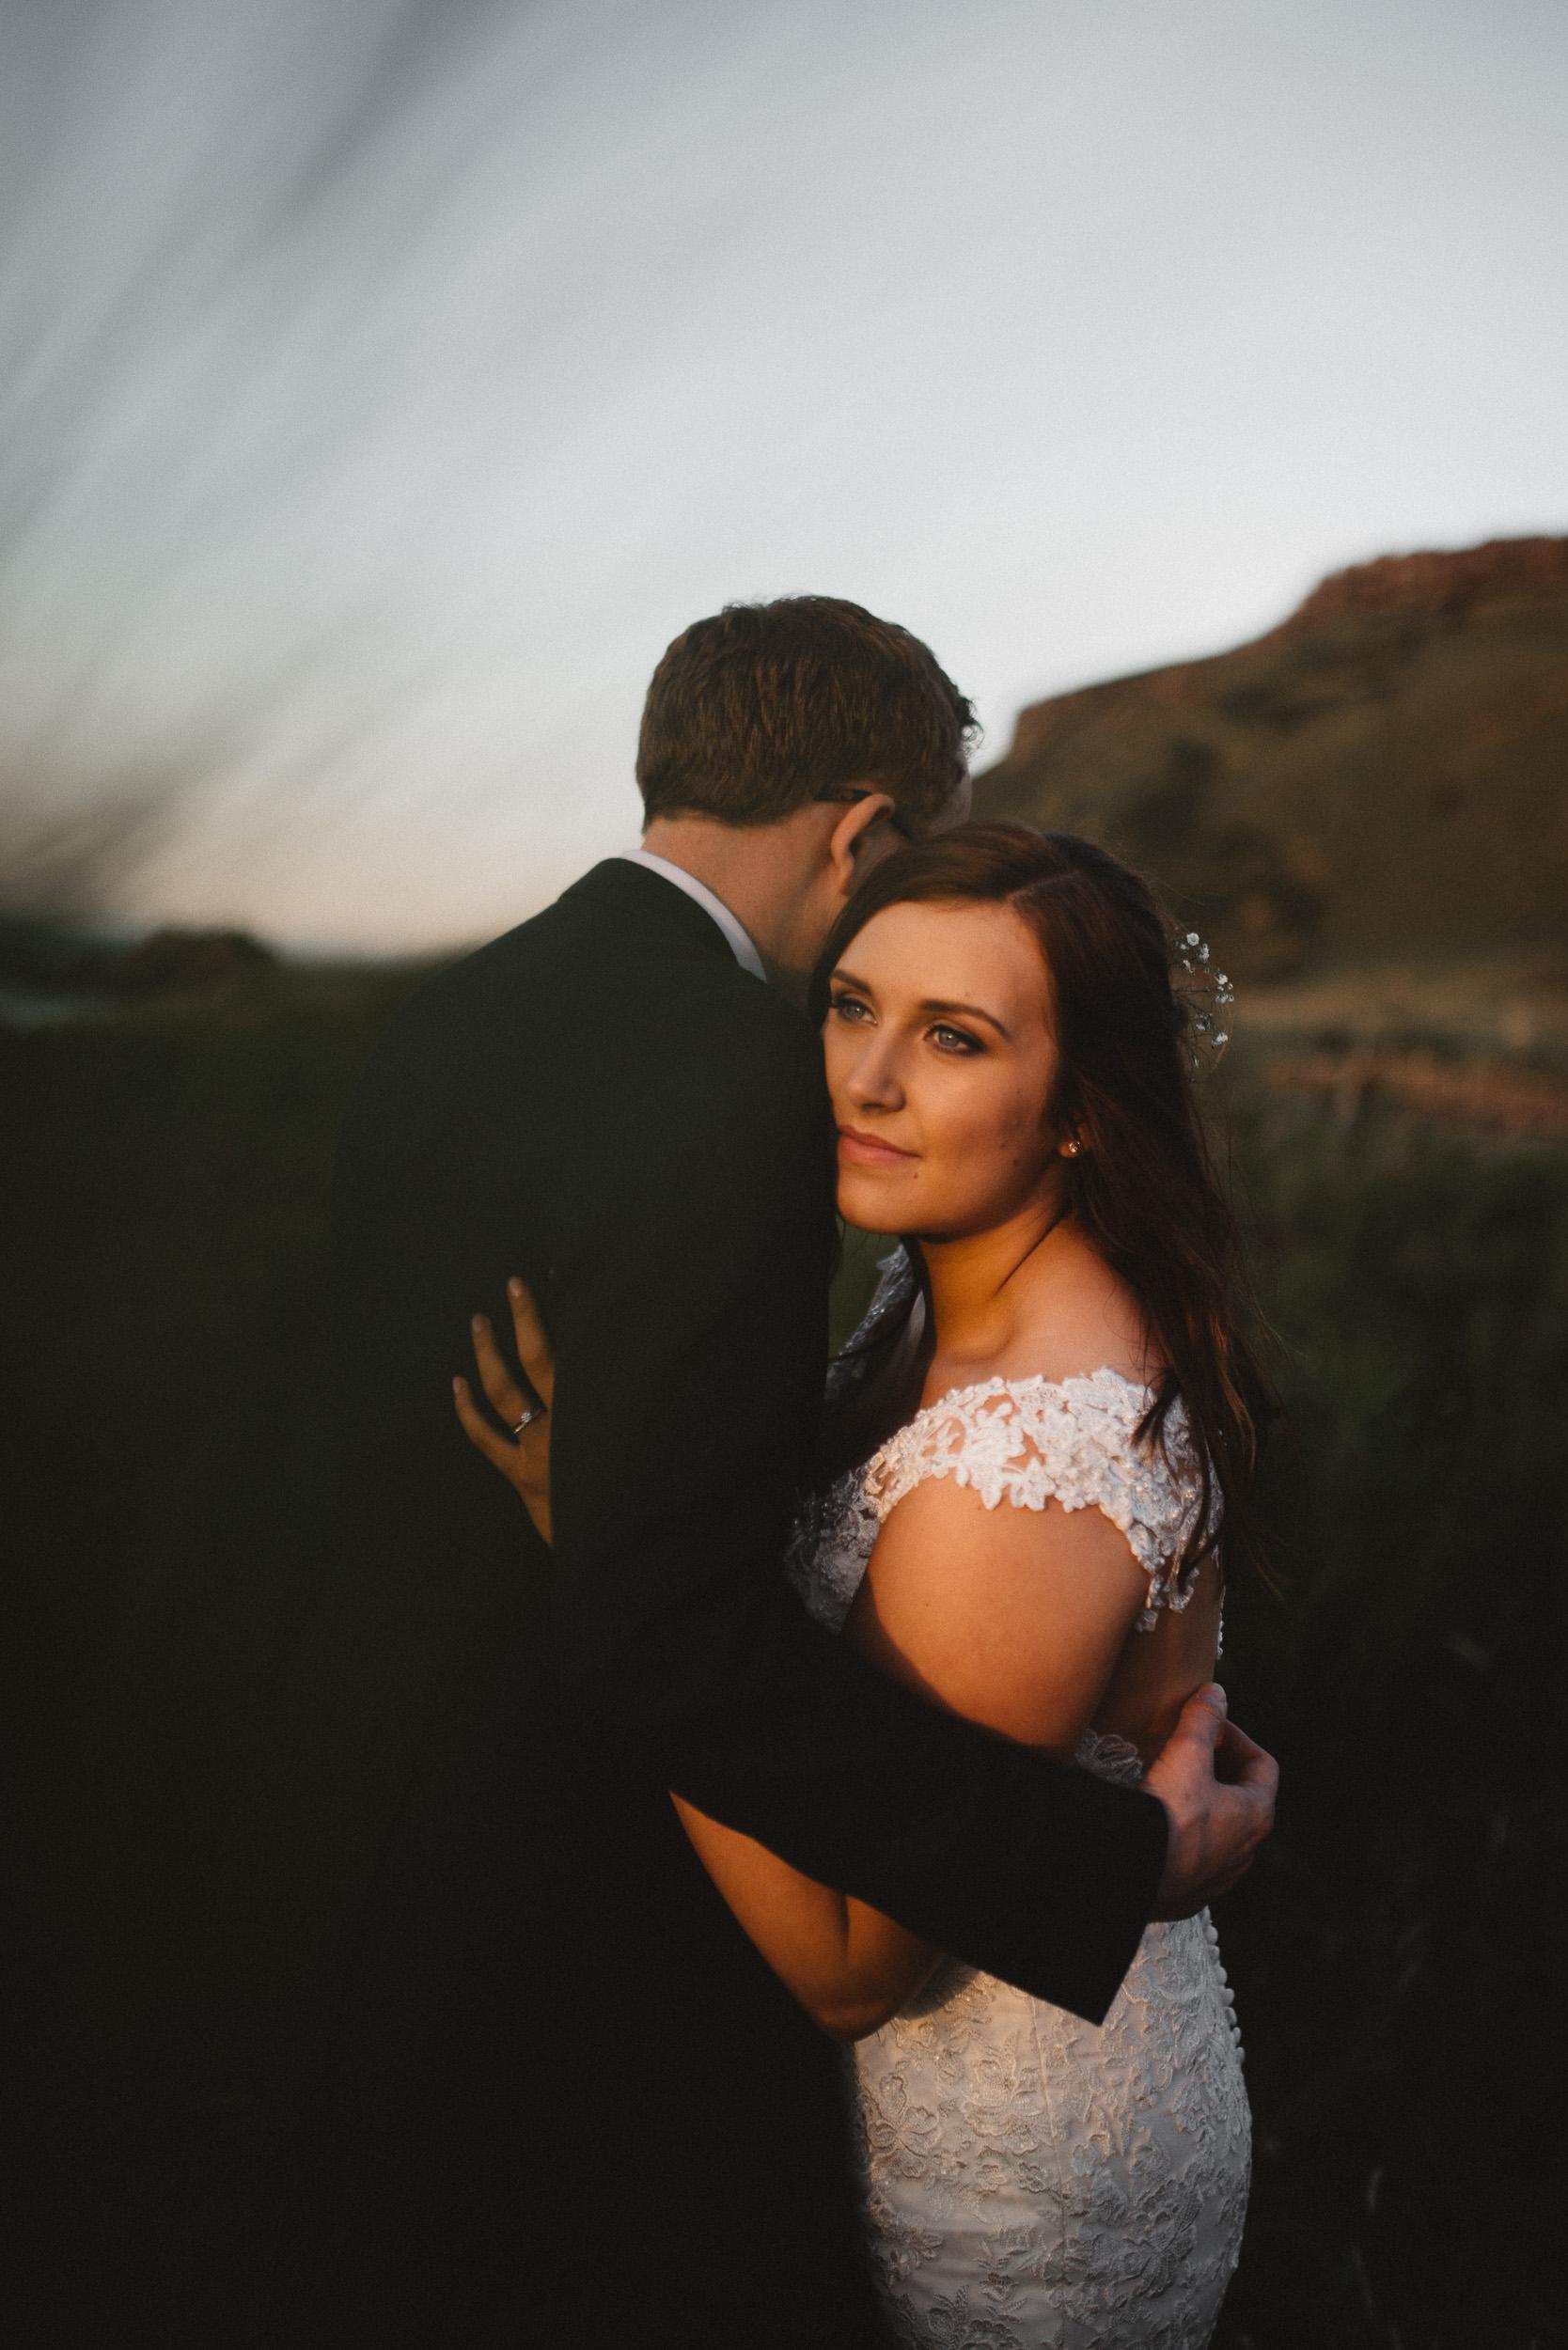 wedding photogaphy peter mackey 2018 beth-14.jpg